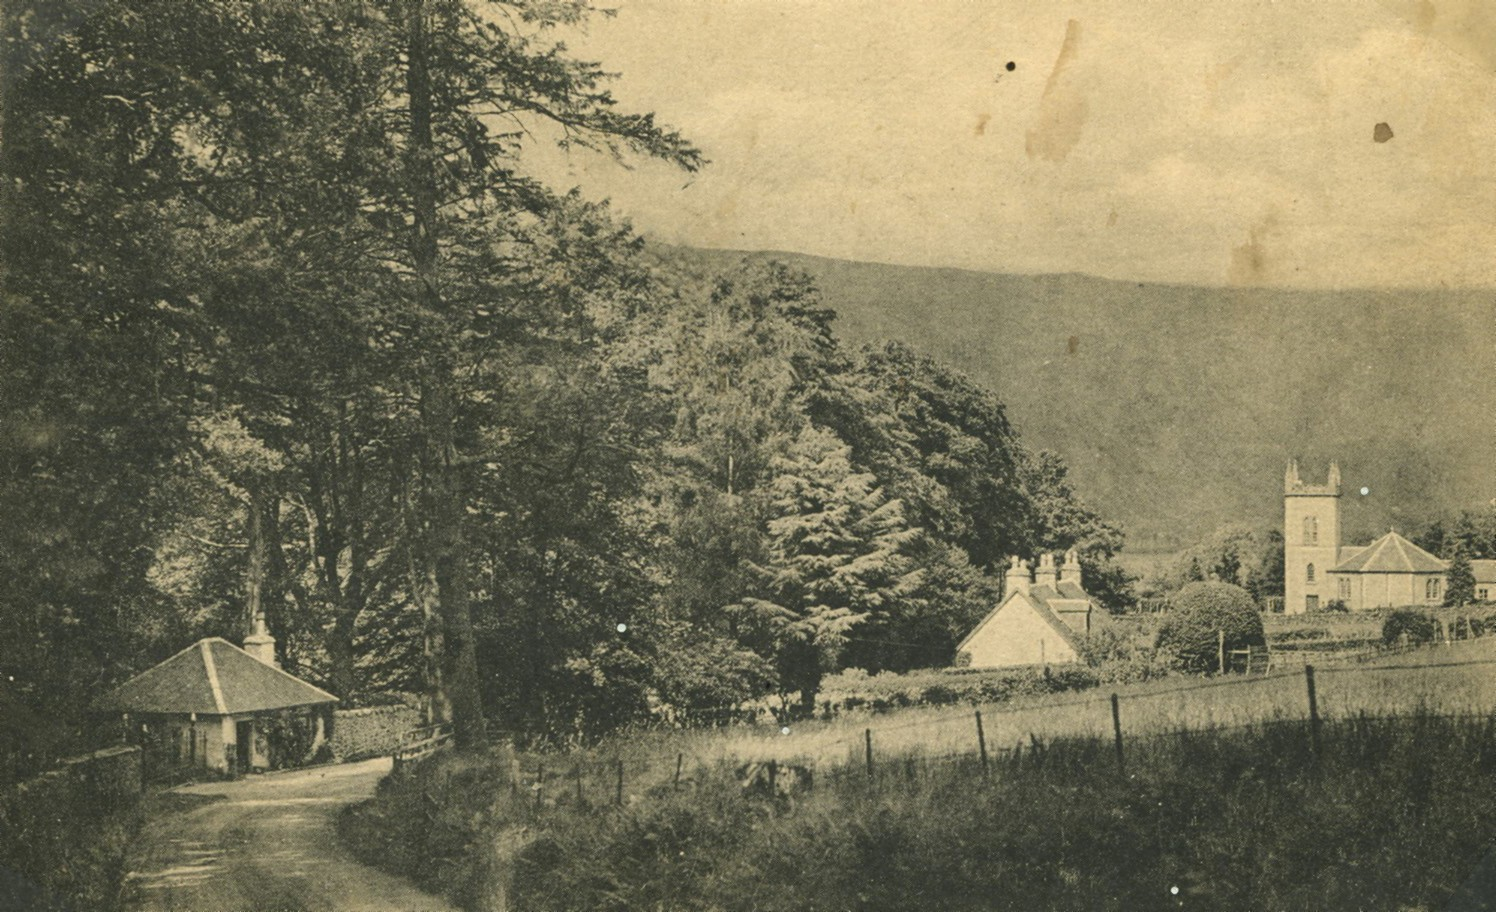 North Lodge at Ardkinglas Estate gates